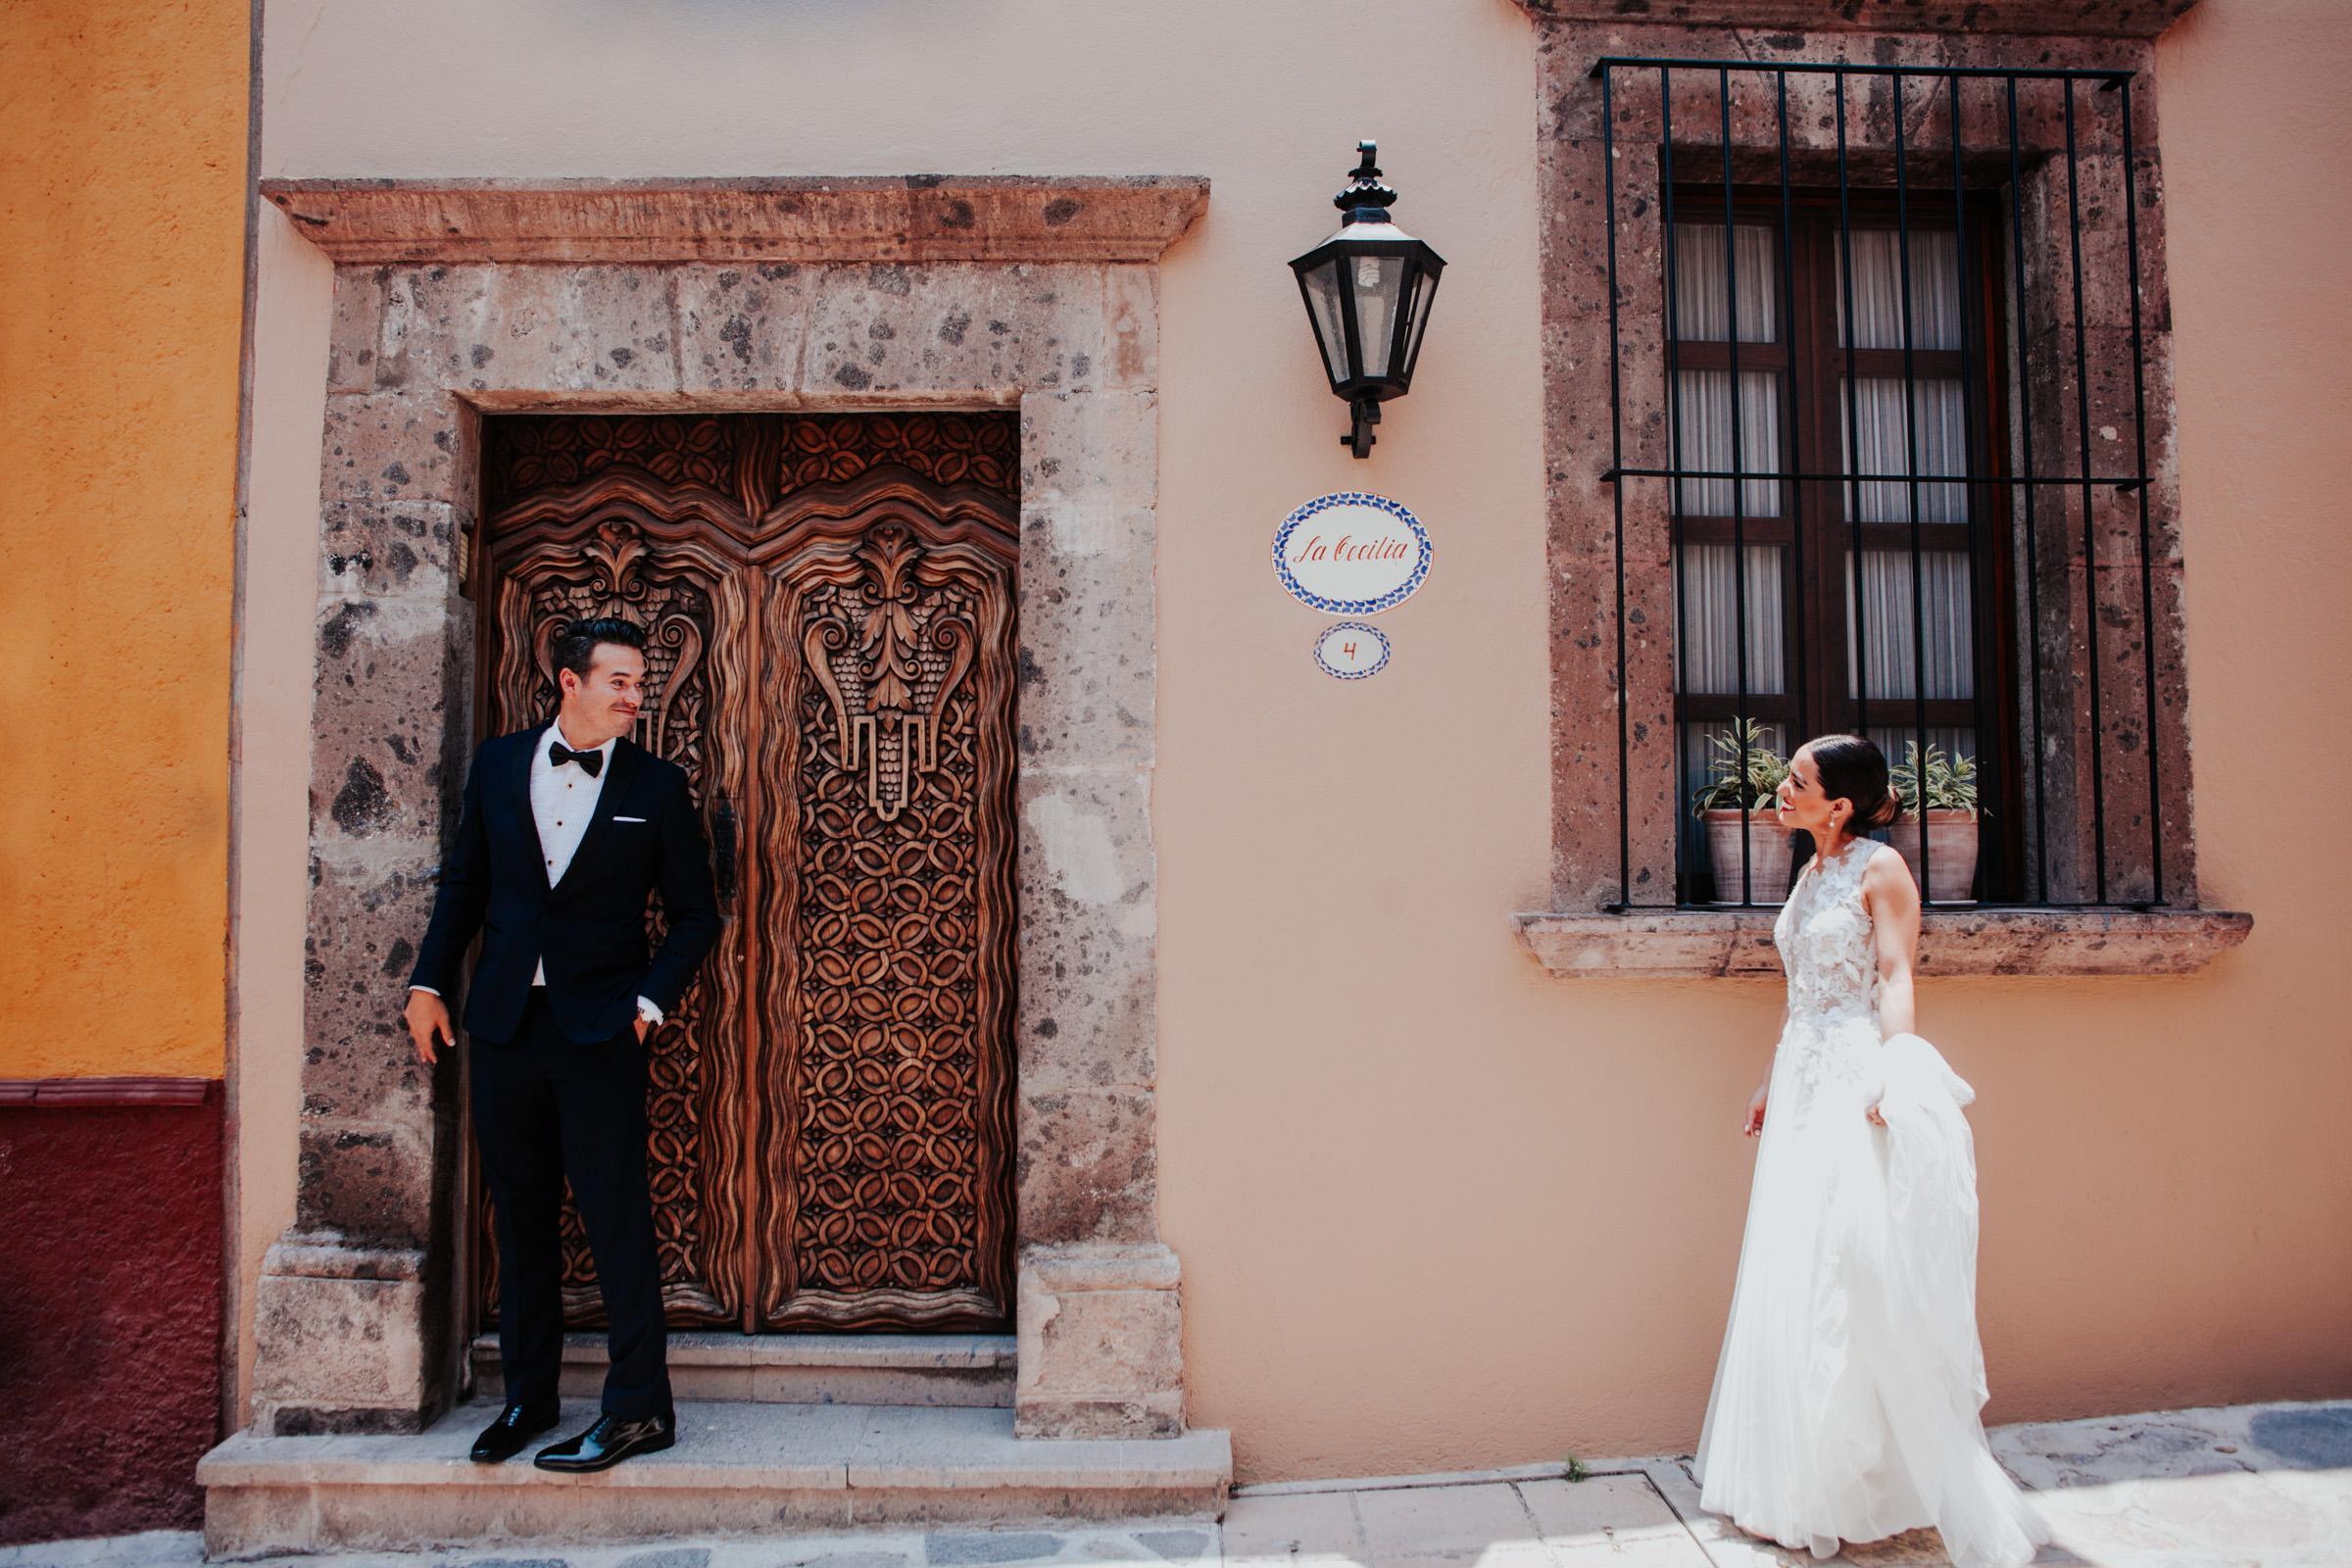 San-Miguel-de-Allende-Wedding-Photography-Parroquia-Instituto-Boda-Fotografia-Fer-Sergio-Pierce-Lifestyle-Photography0212.JPG